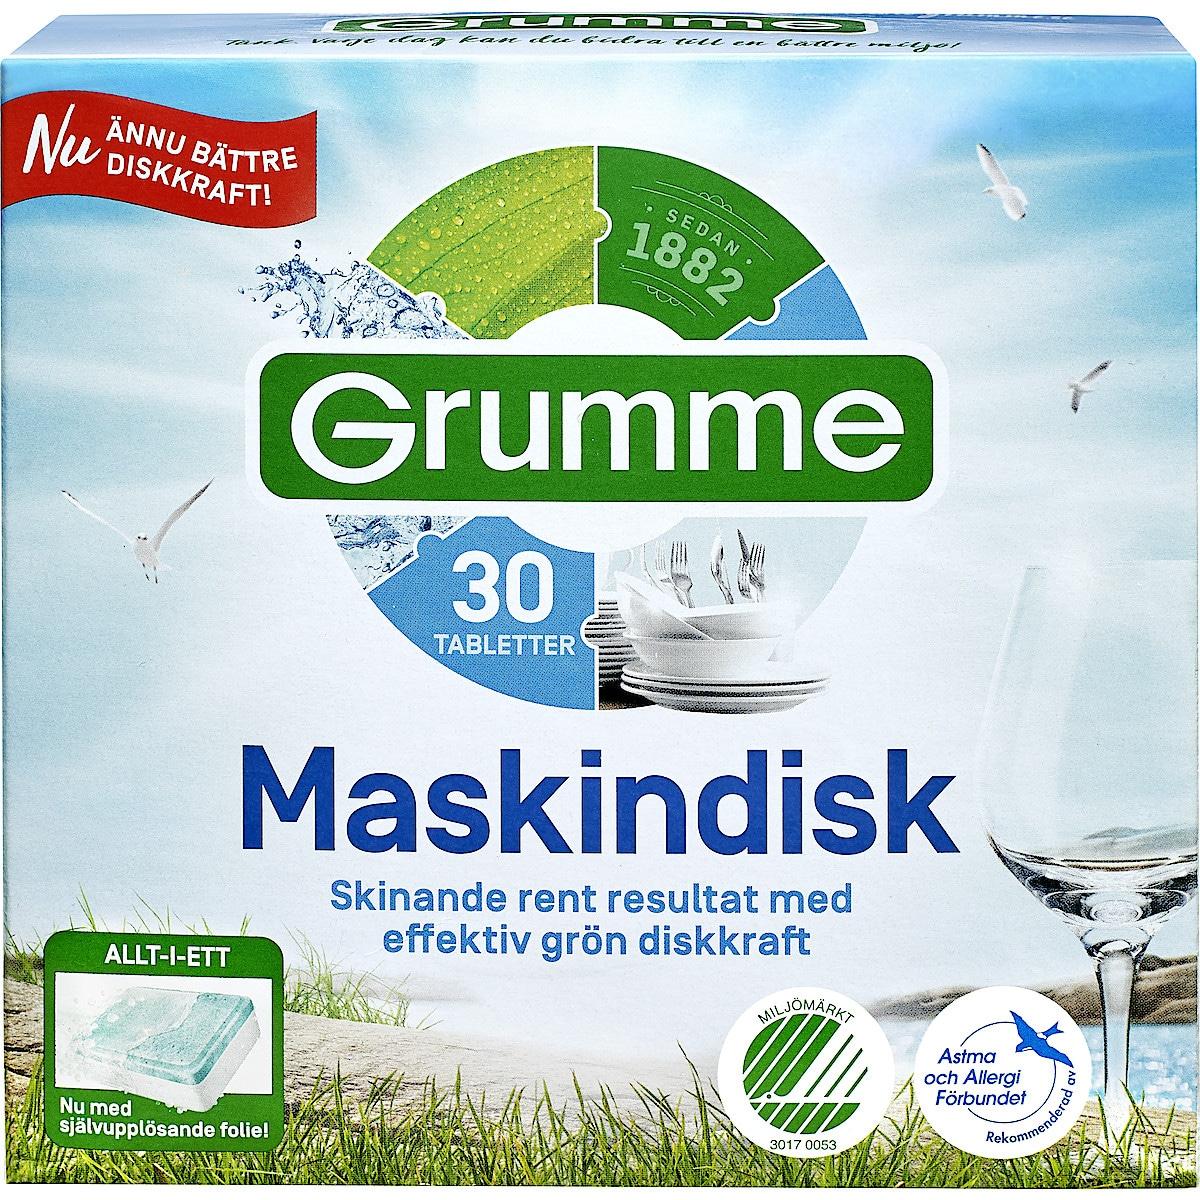 Maskindisktabletter Grumme, 30-pack